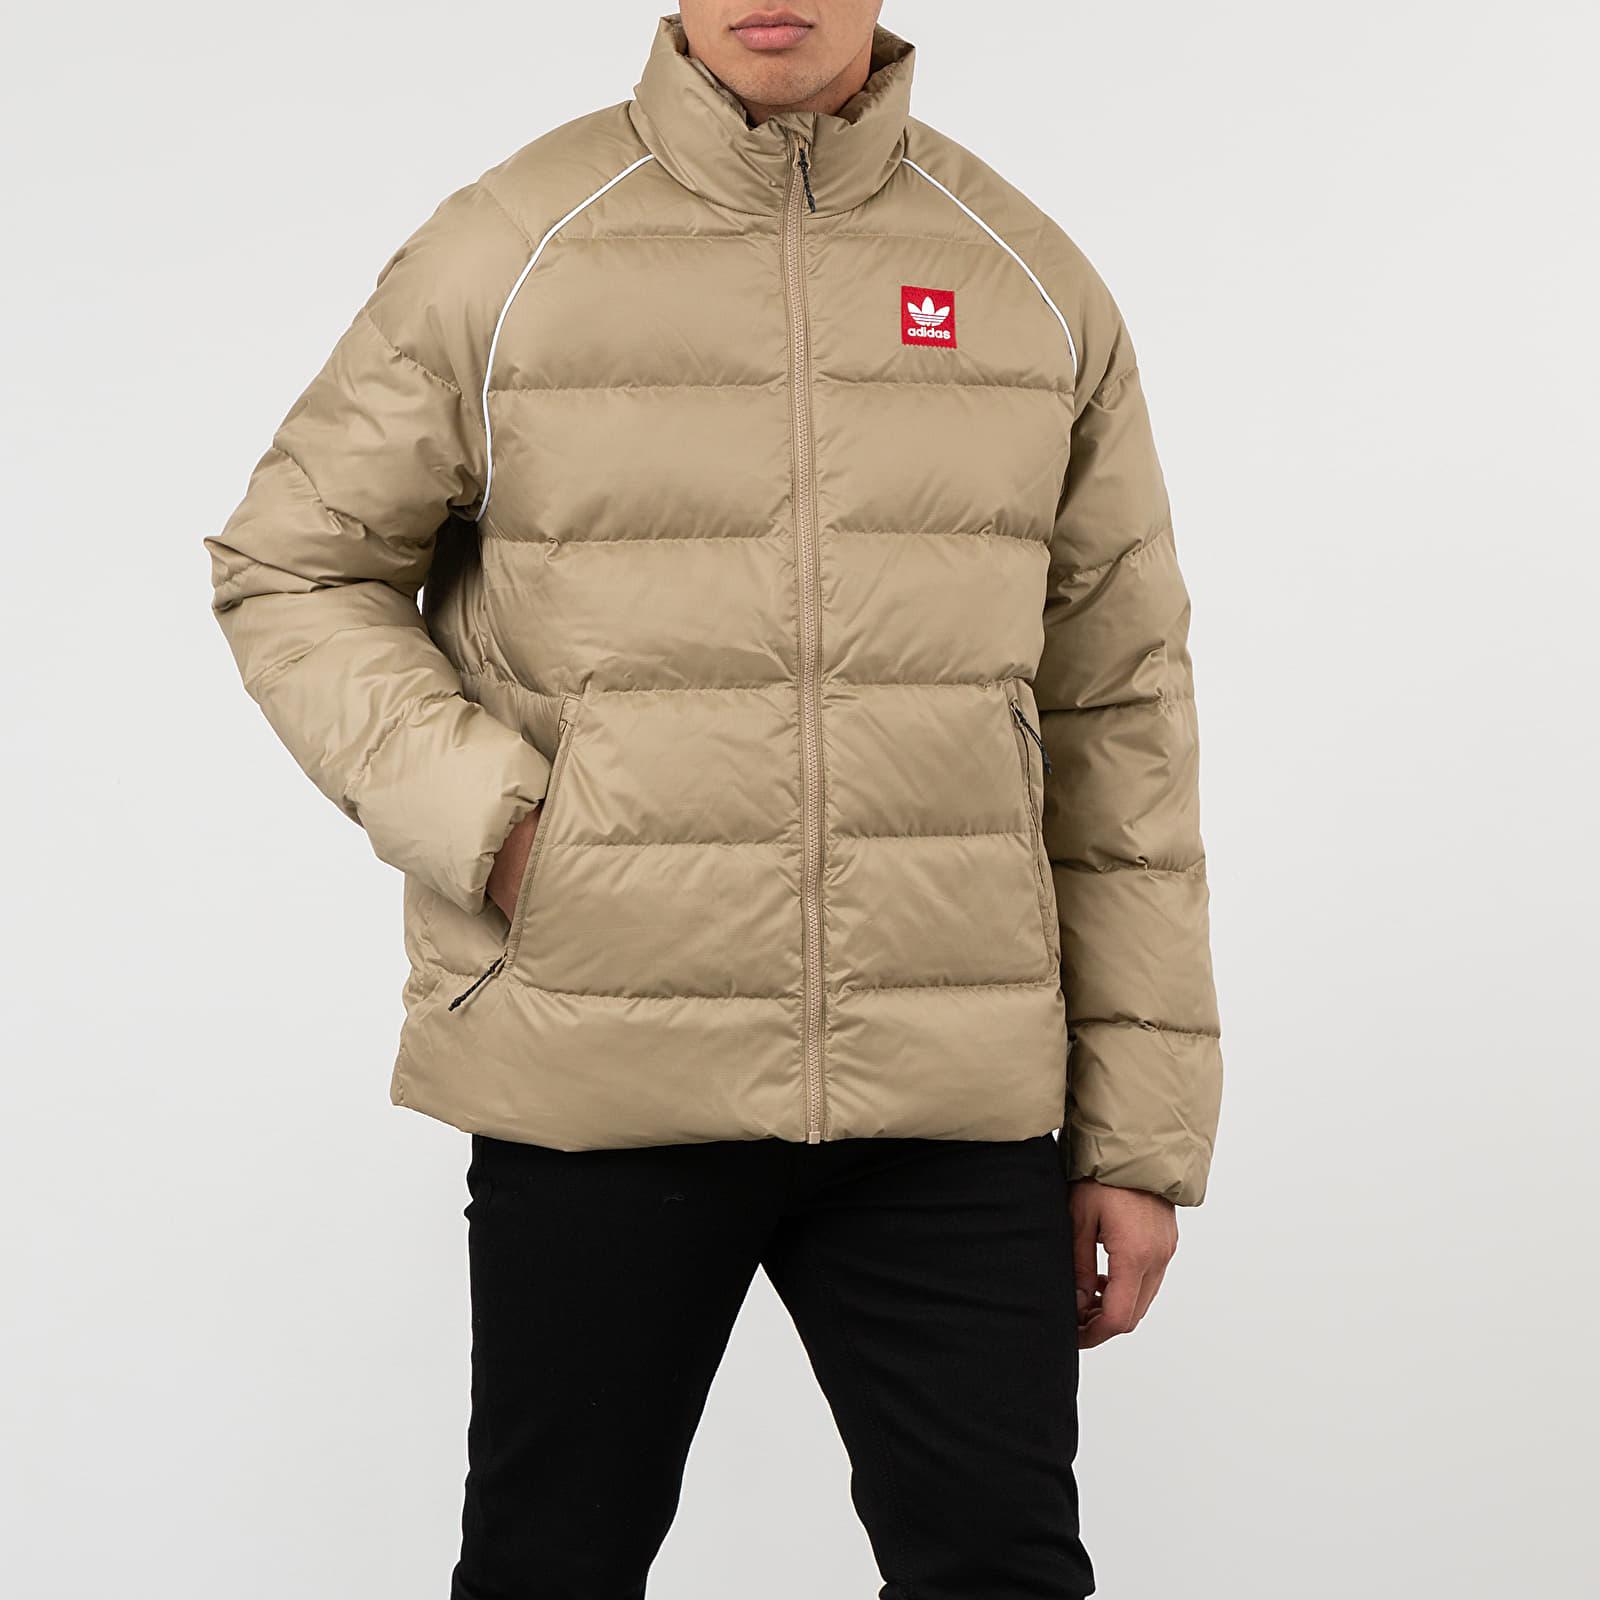 Jackets adidas Adicolor Jacket Hemp/ Power Red